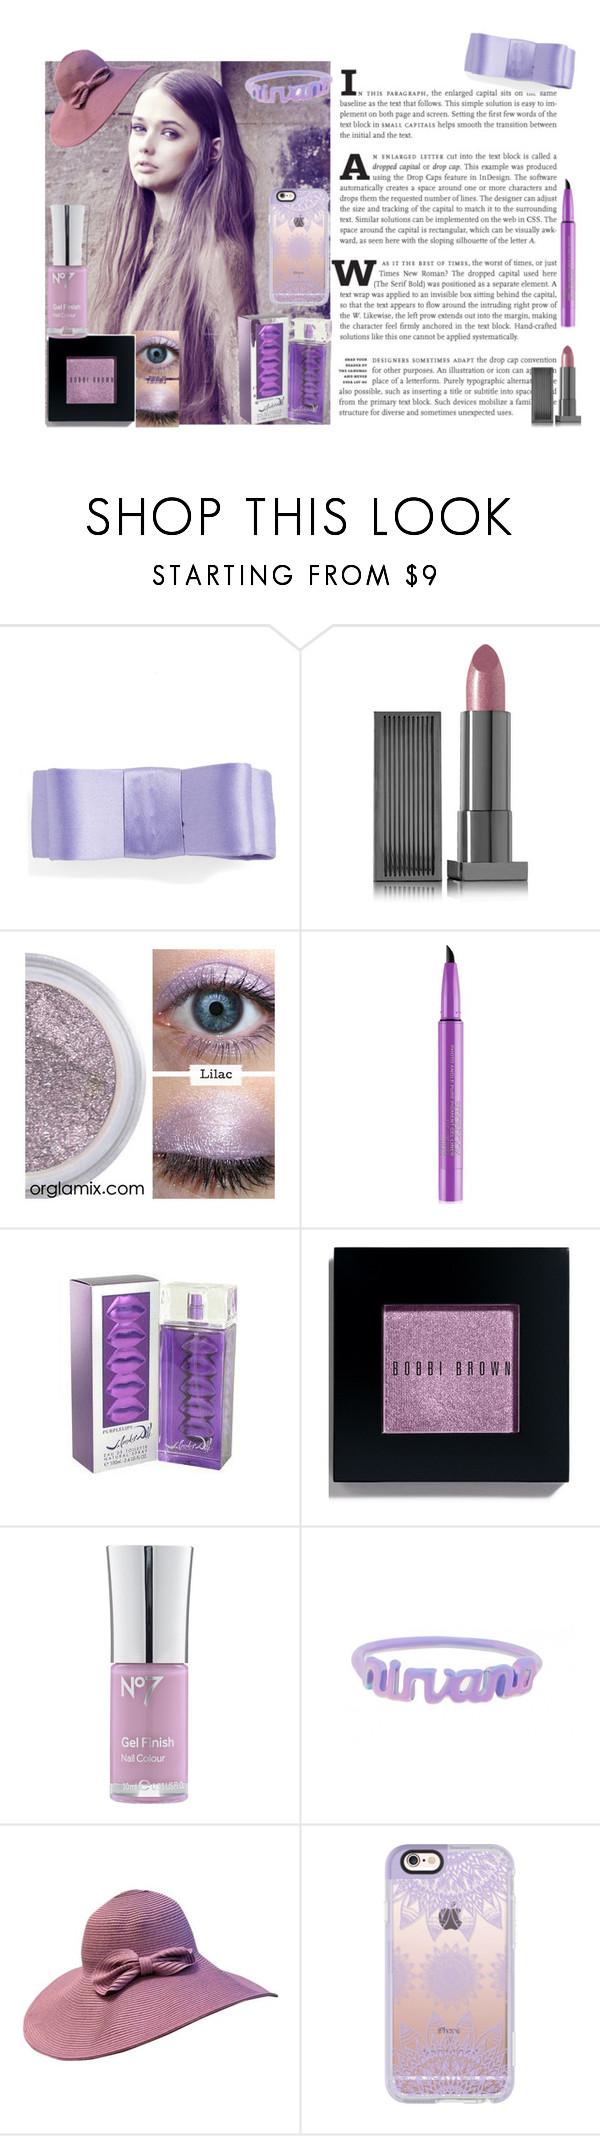 """Başlıksız #20"" by deniz-d ❤ liked on Polyvore featuring beauty, L. Erickson, Lipstick Queen, Smashbox, Salvador Dali, Bobbi Brown Cosmetics and Casetify"